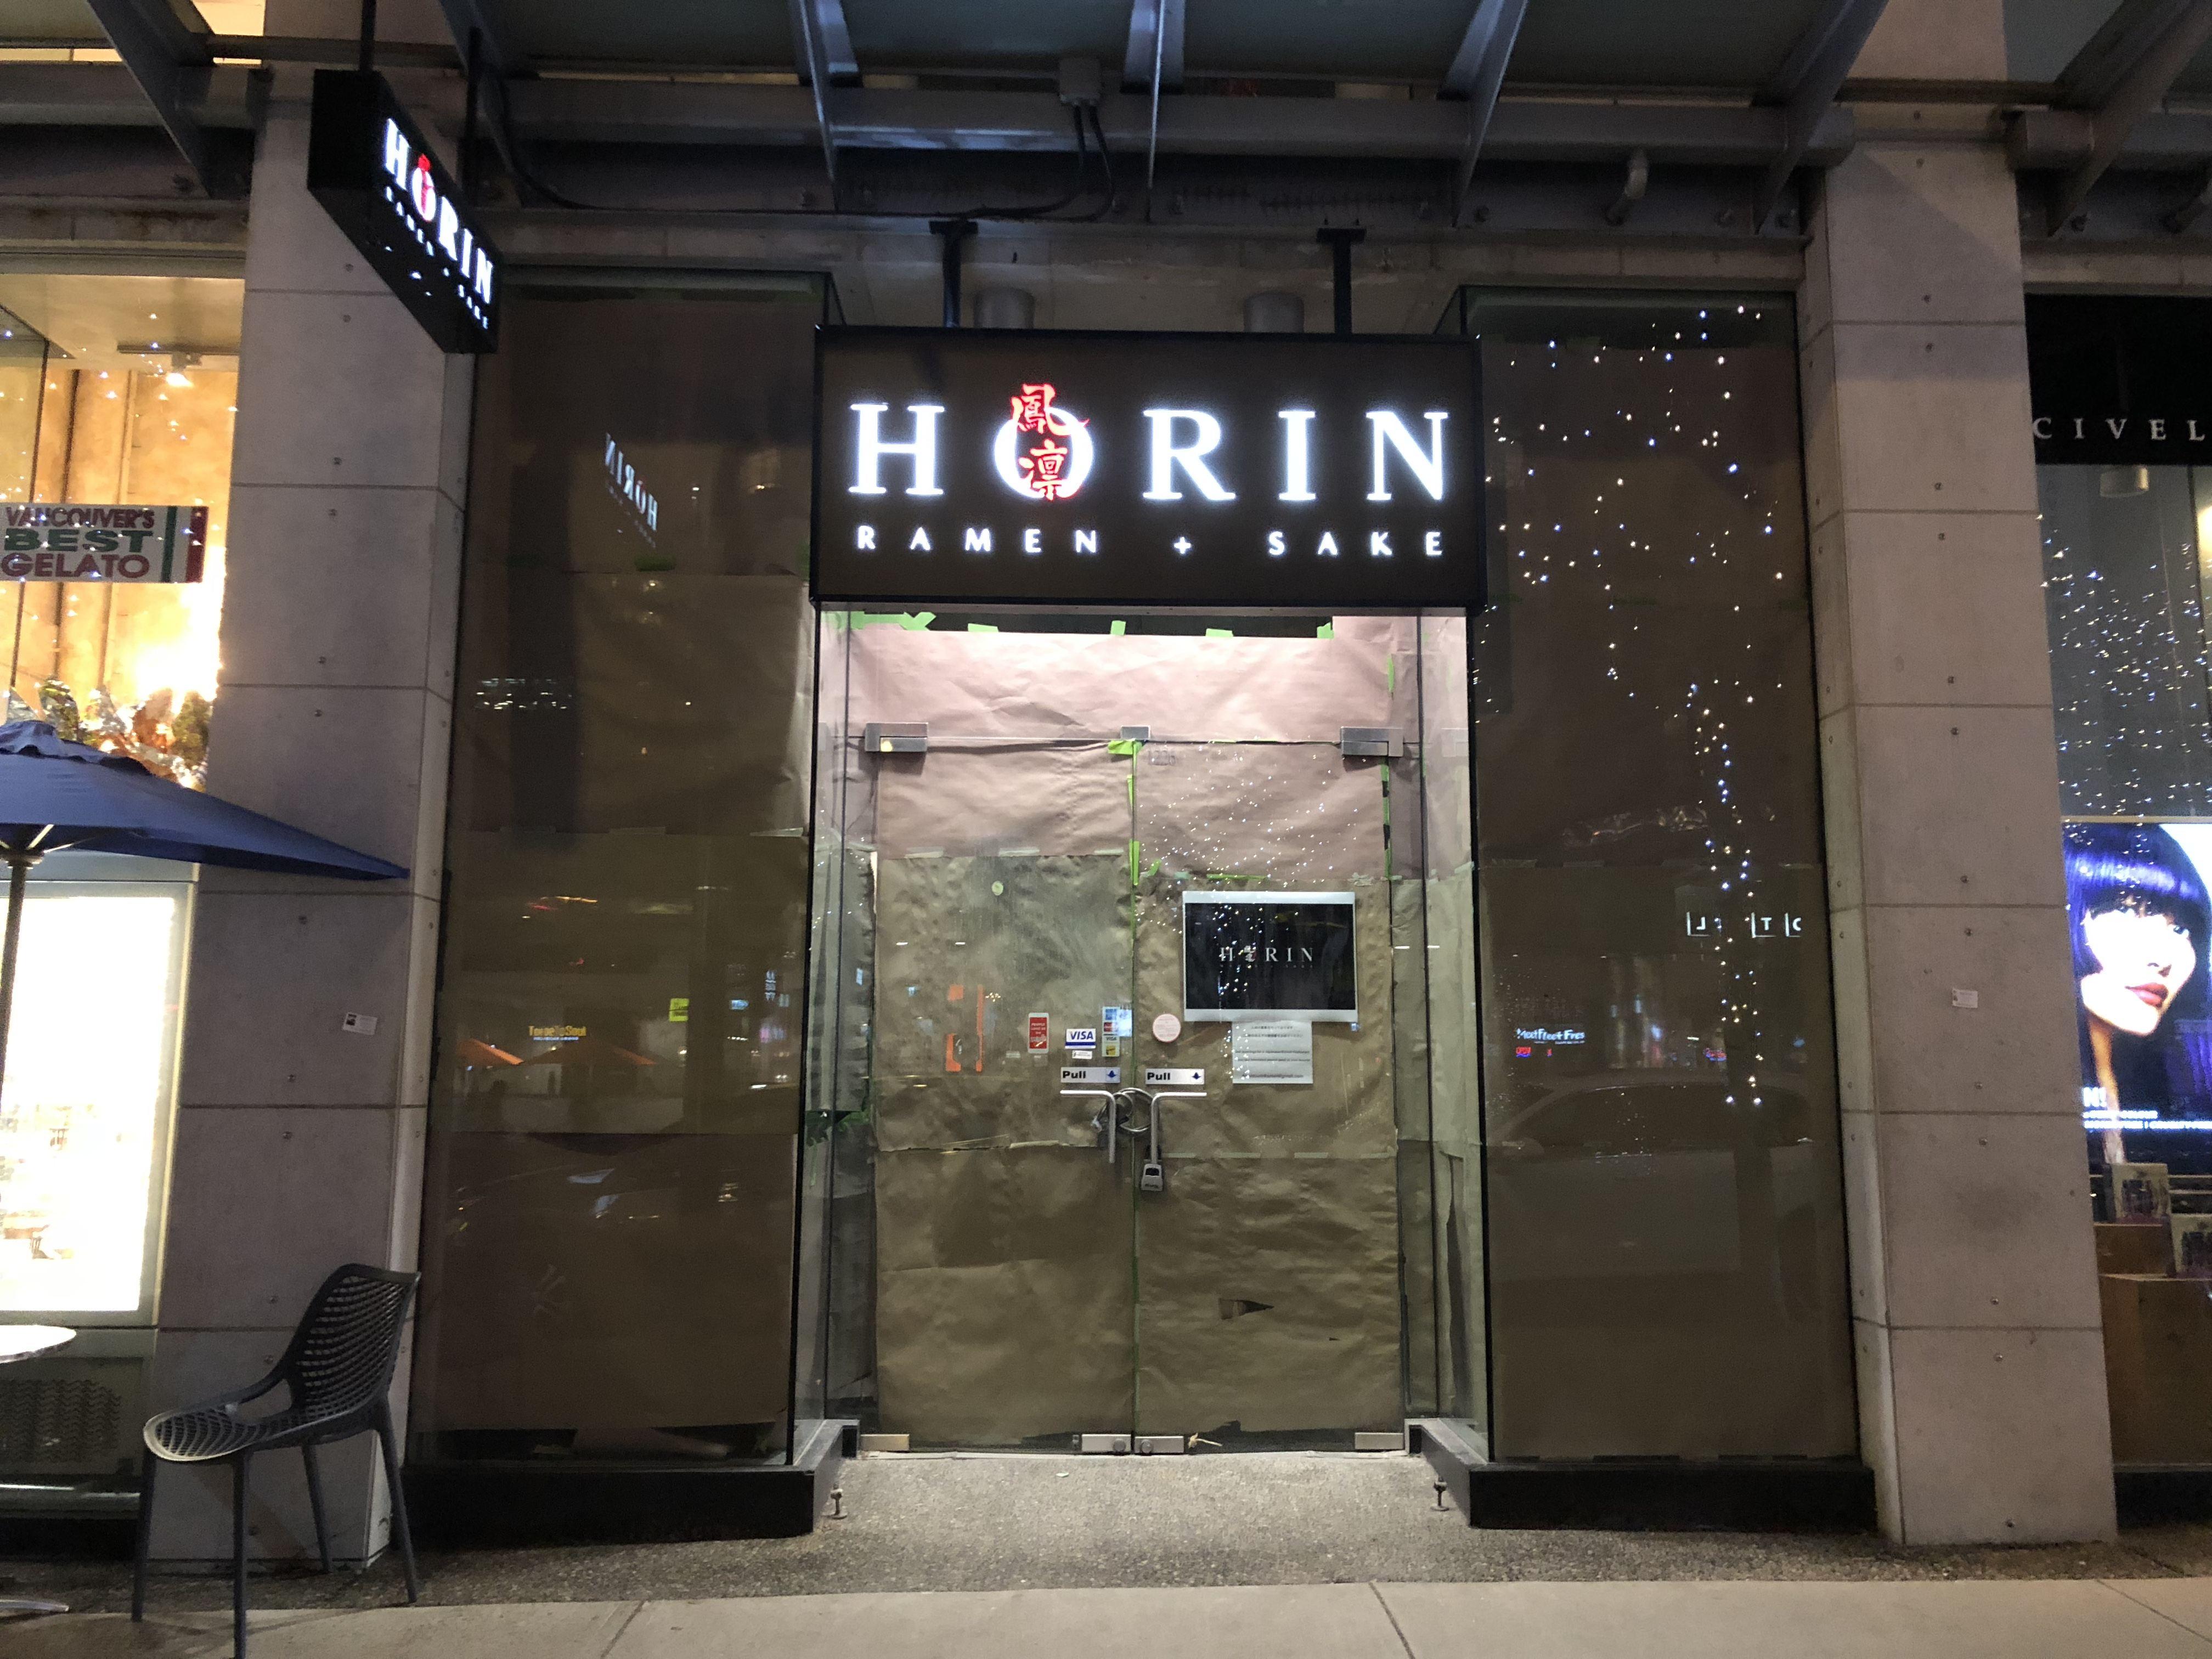 Horin Ramen + Sake